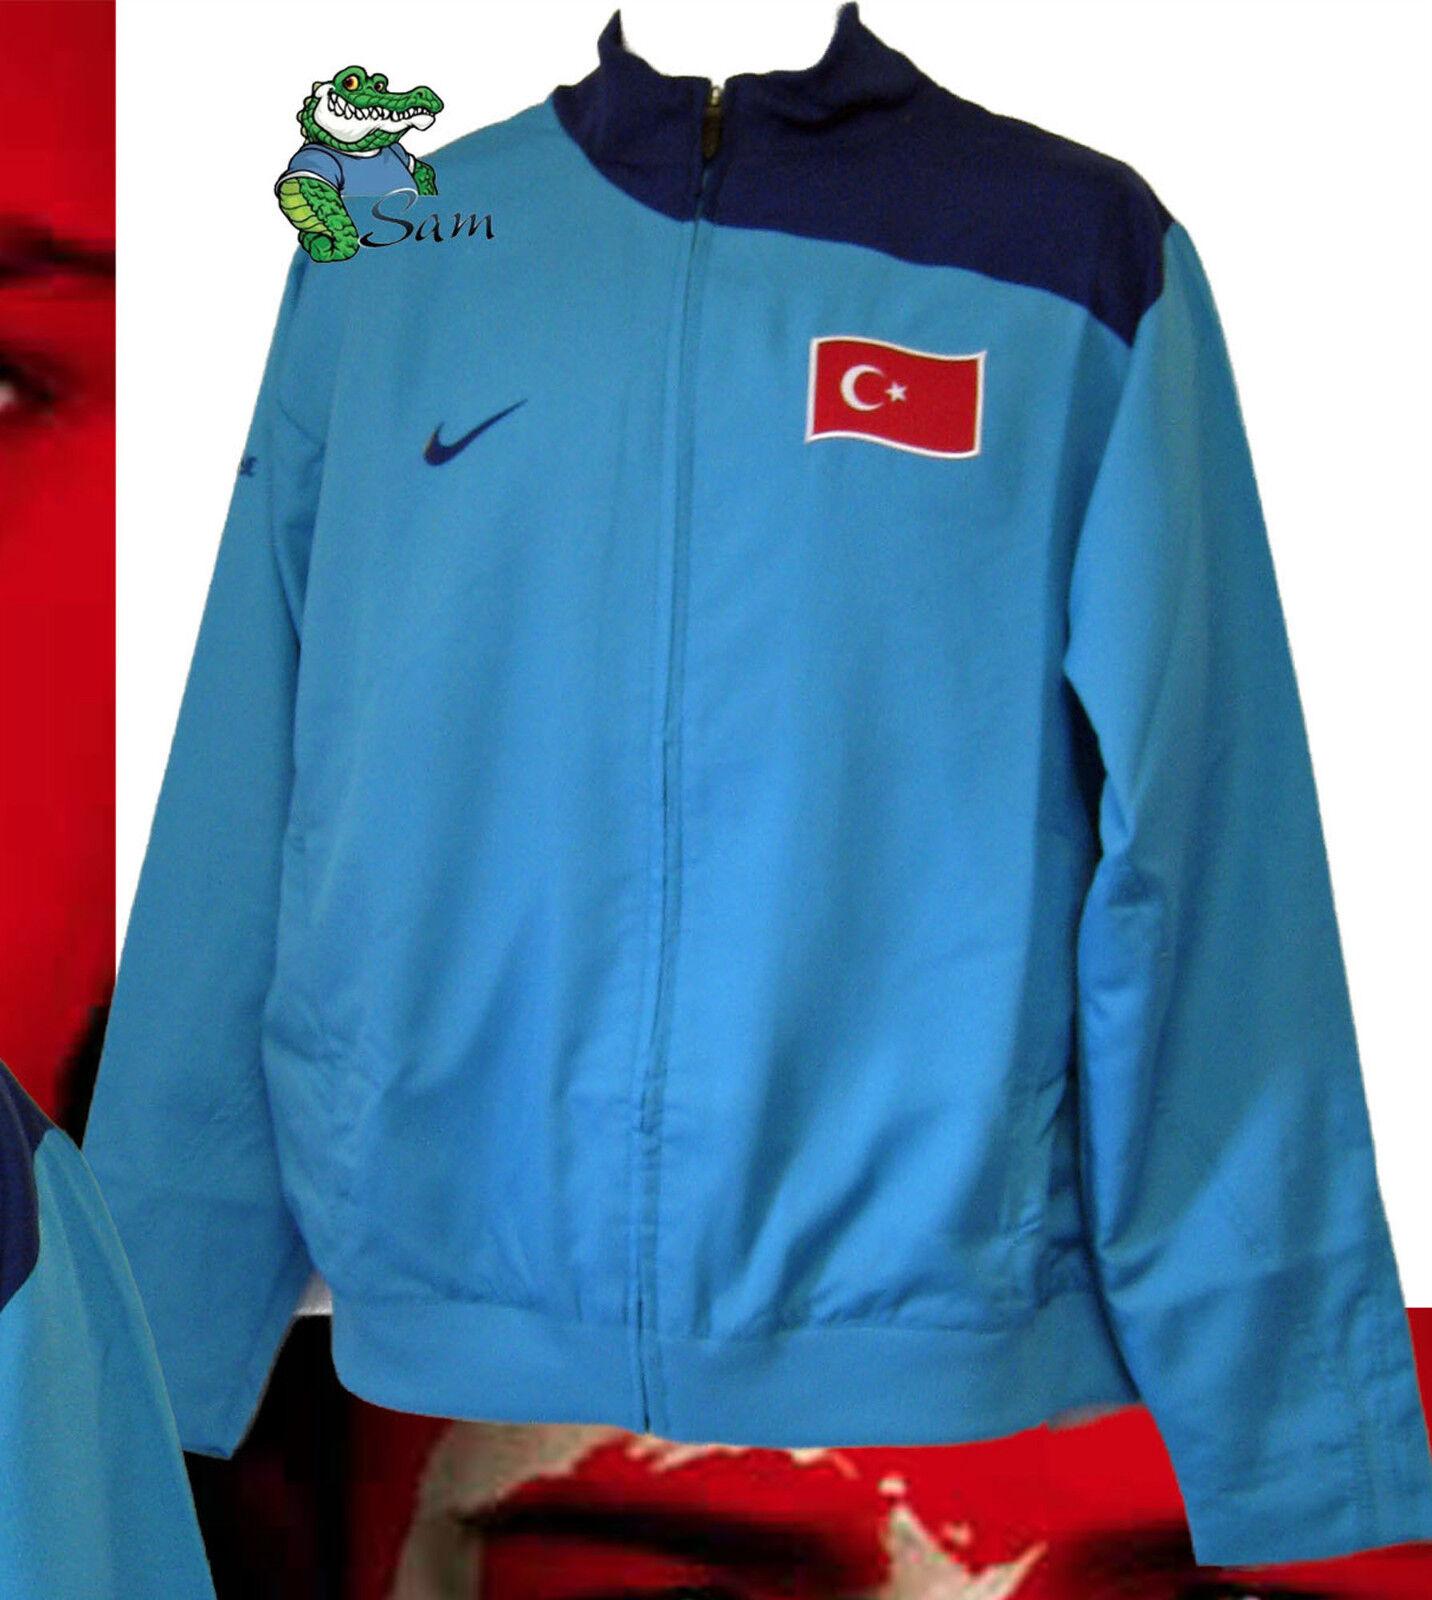 Neu nike Türkei Fußball Trainingsanzug Jacke Türkis Groß L